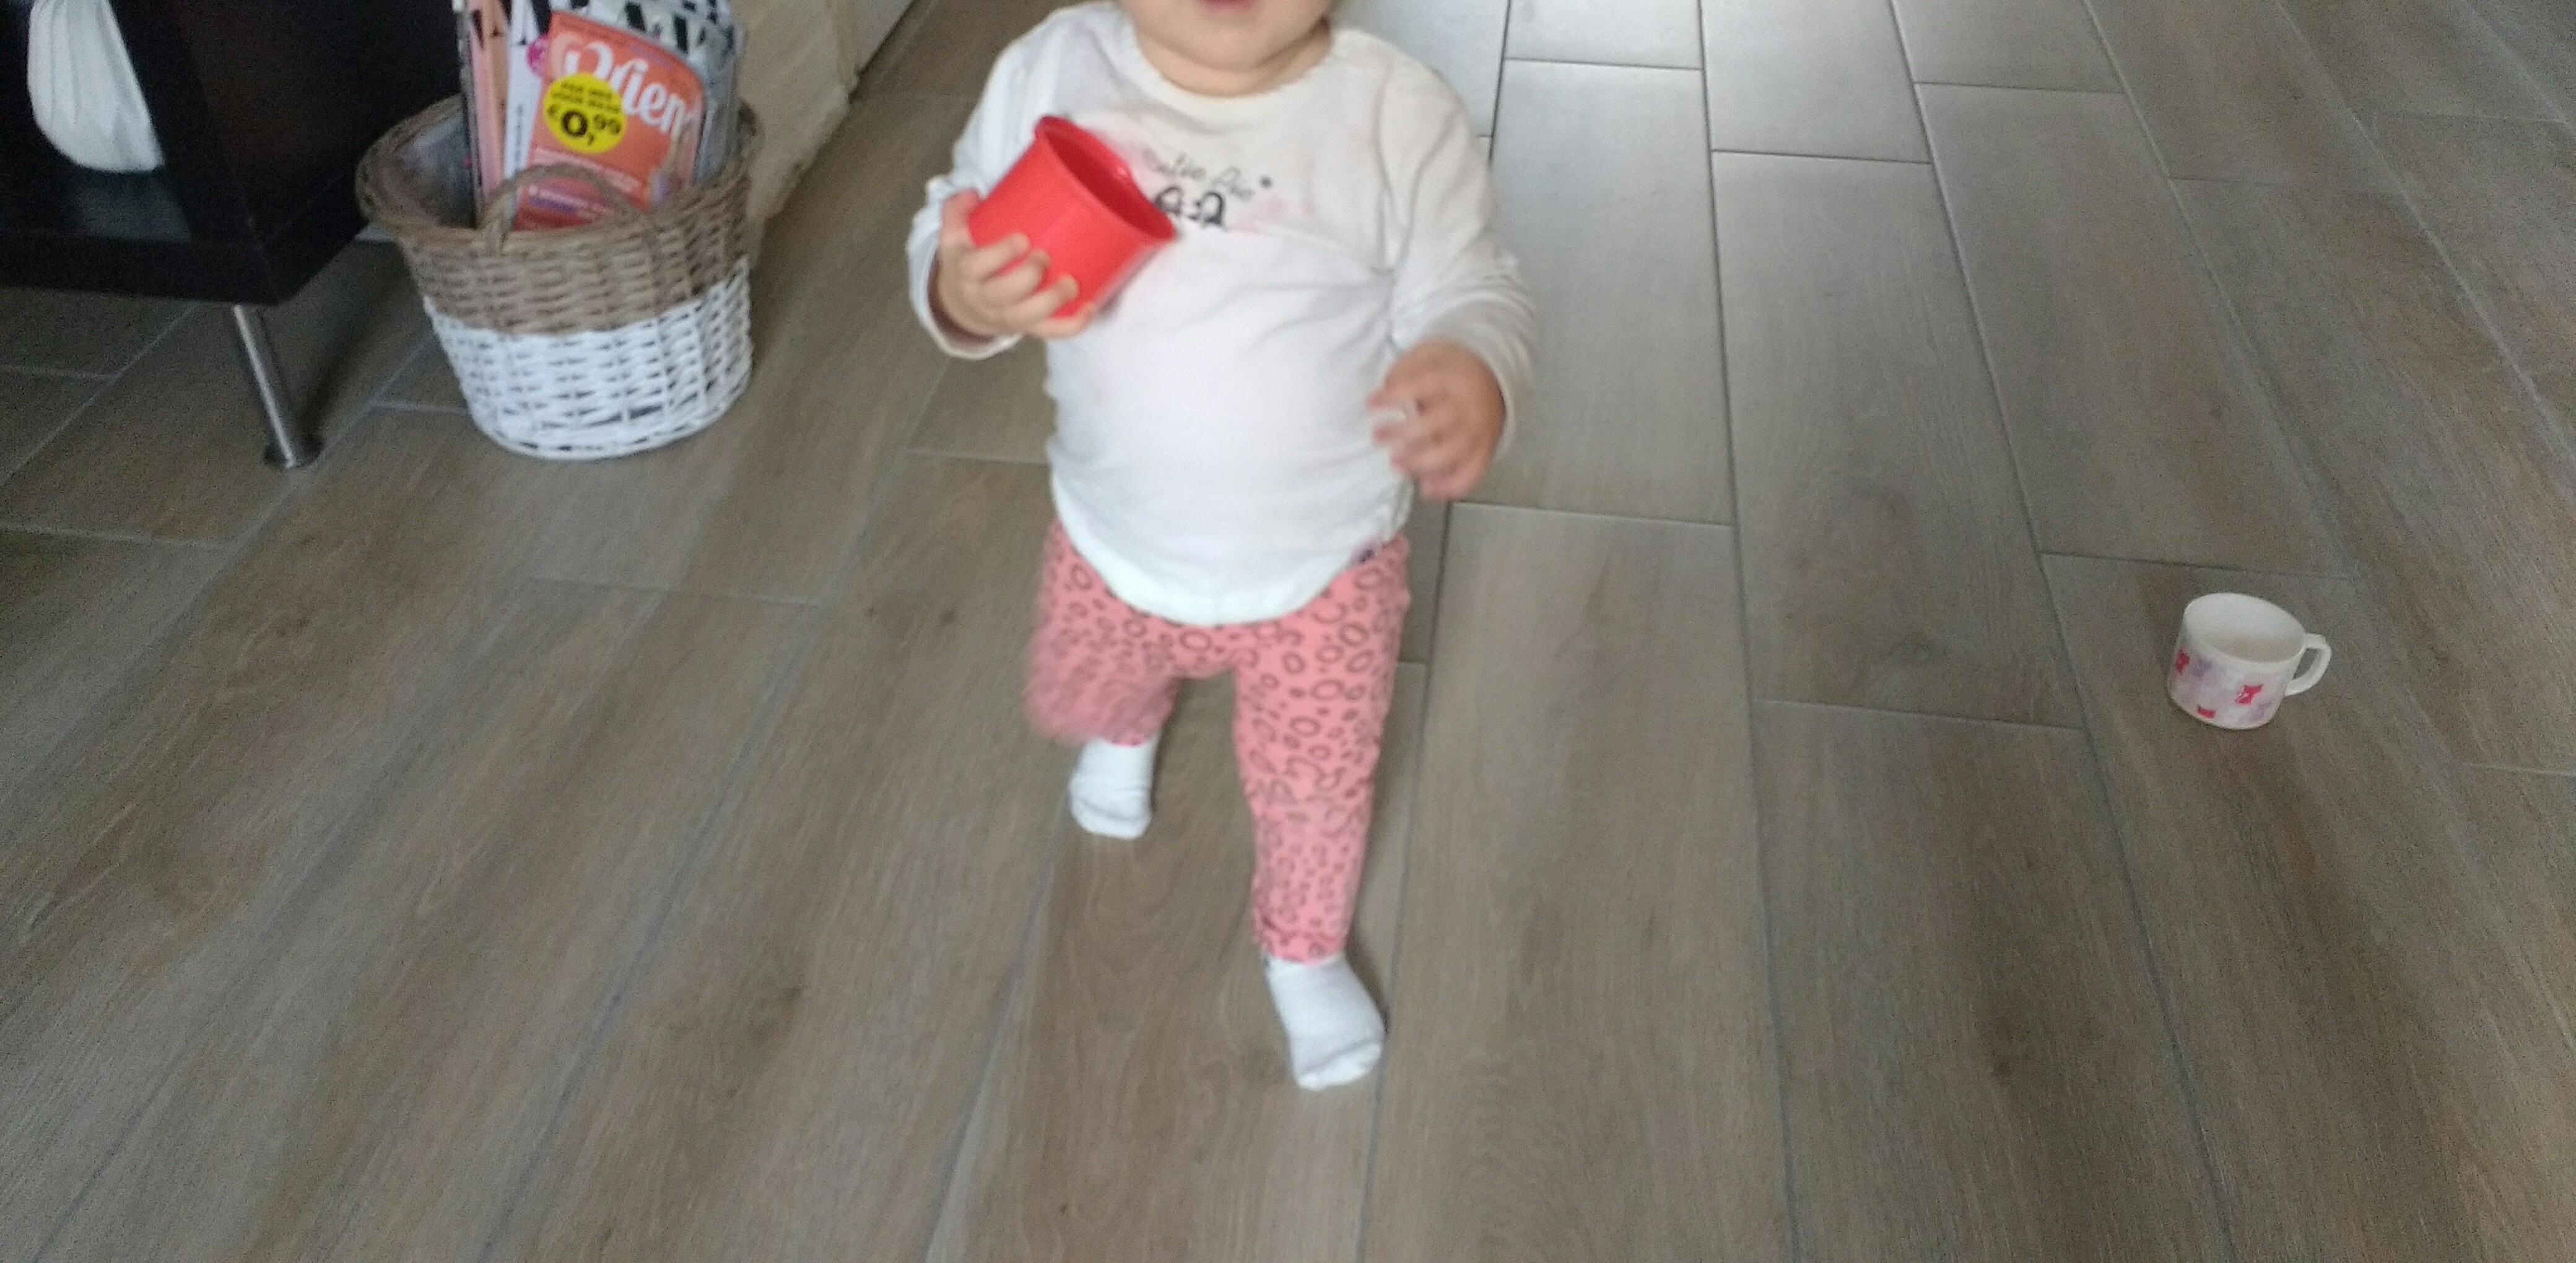 lopen, baby, wanneer baby lopen, dreumes lopen, blog, mamablog, lifestyle blog, mama-lifestyleblog, La Log.nl